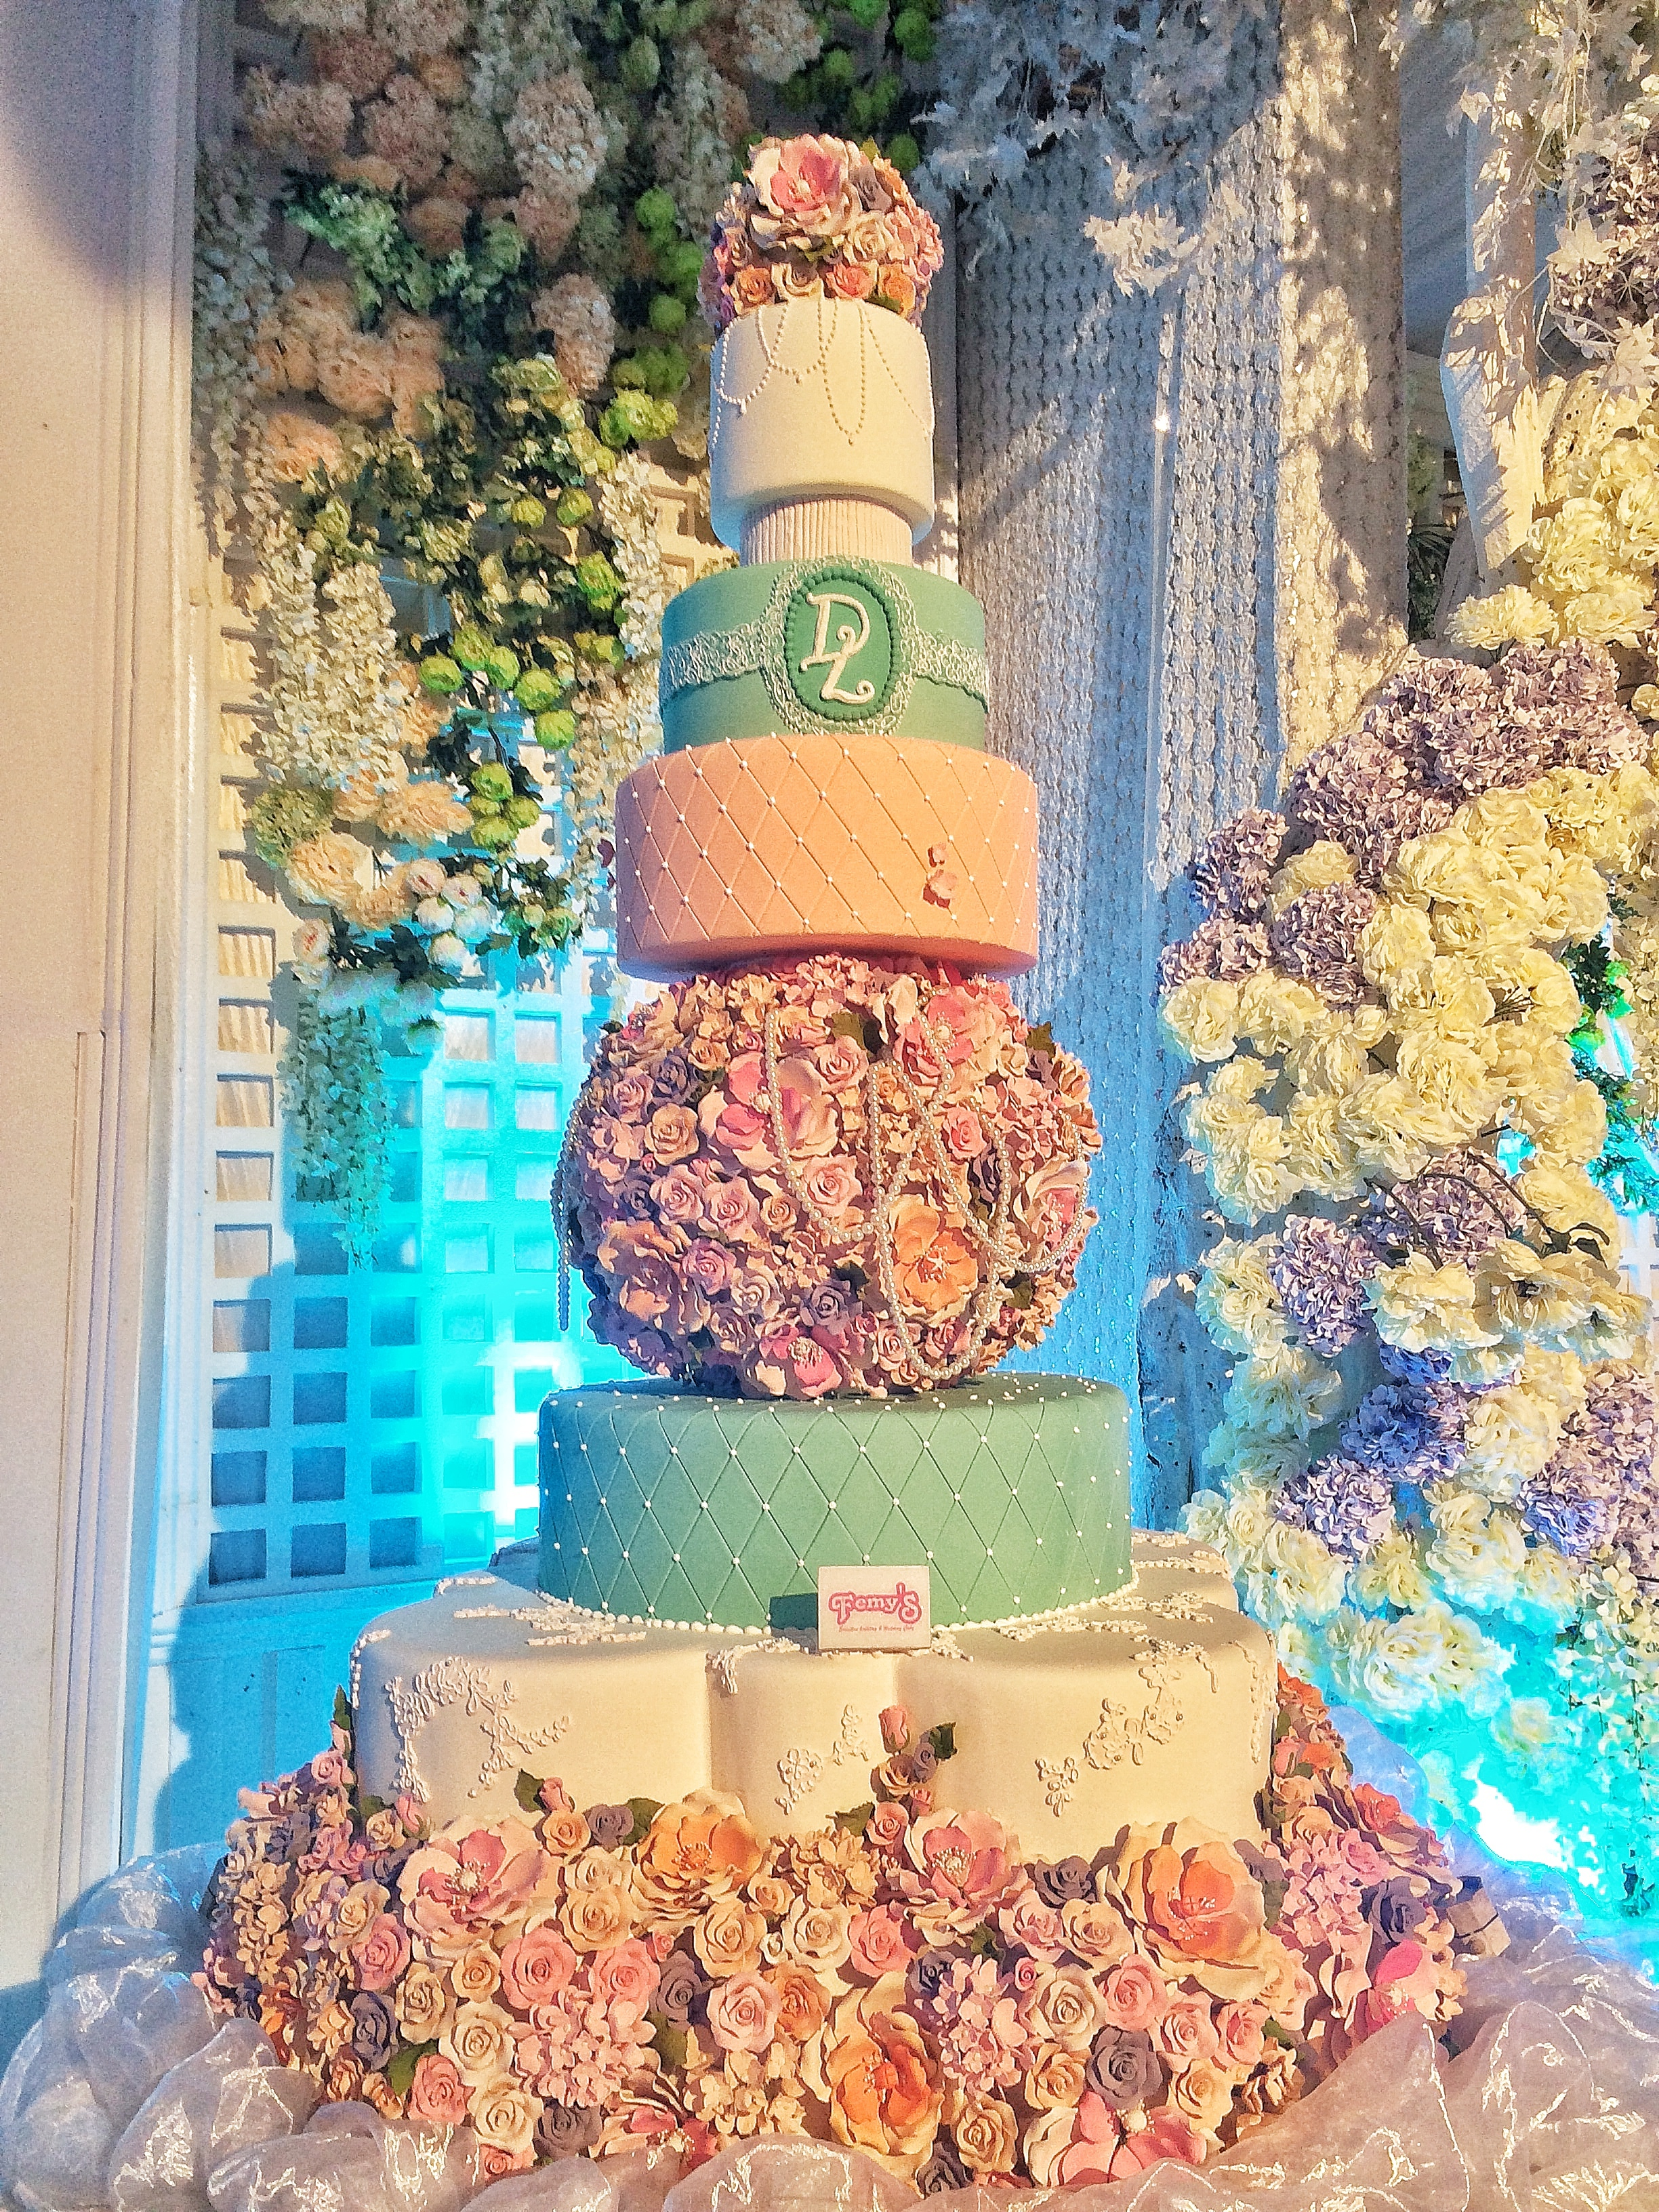 Wedding Cake 101: An Introduction to Wedding Cakes Image 9